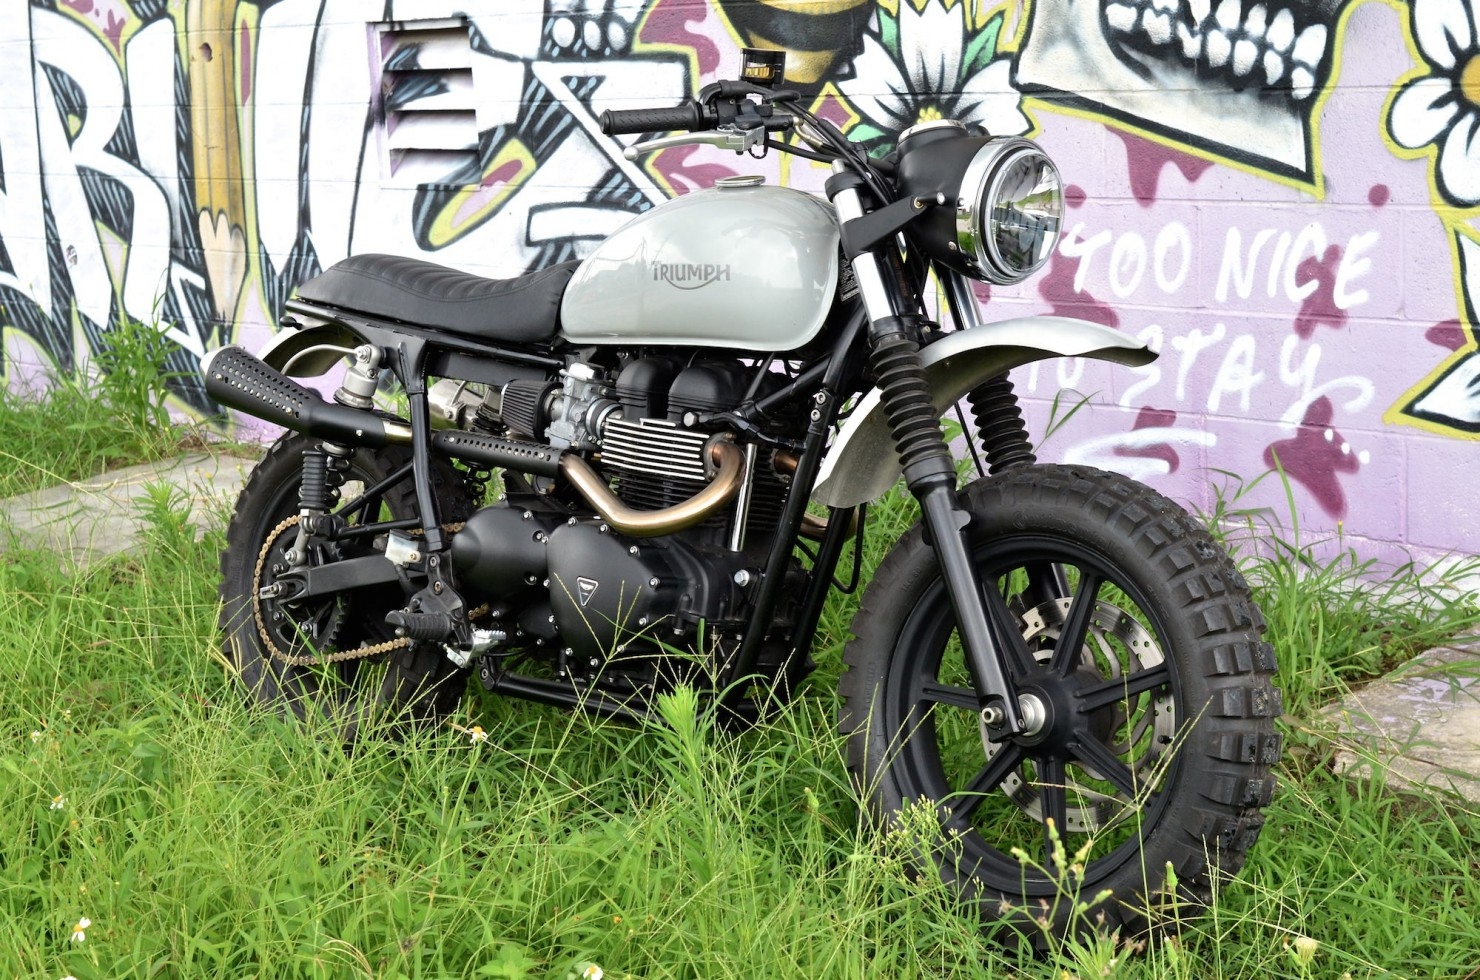 Triumph Scrambler Motorcycle 10